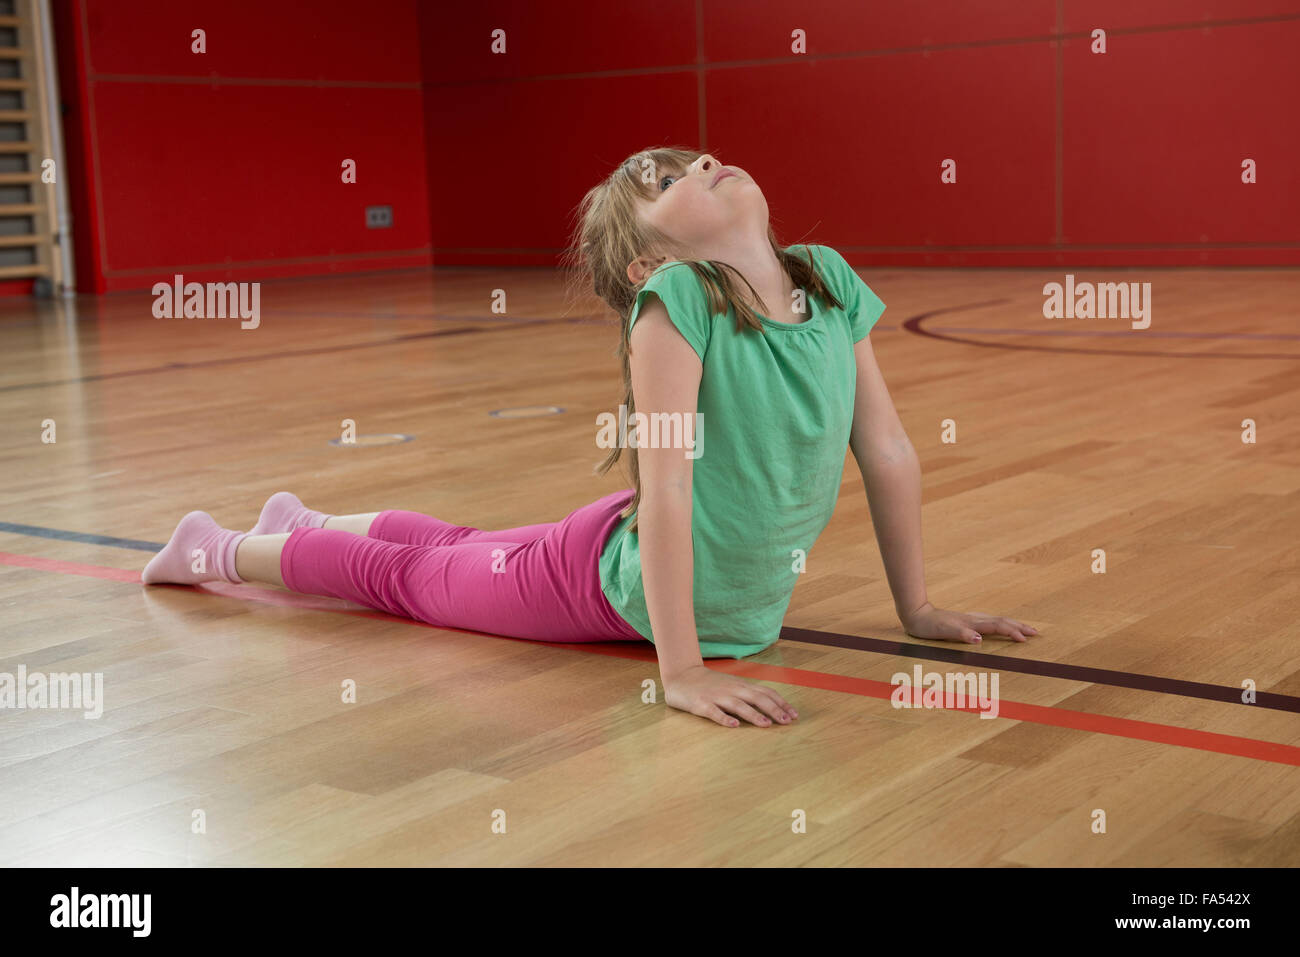 Girl practicing upward facing dog position in sports hall, Munich, Bavaria, Germany - Stock Image